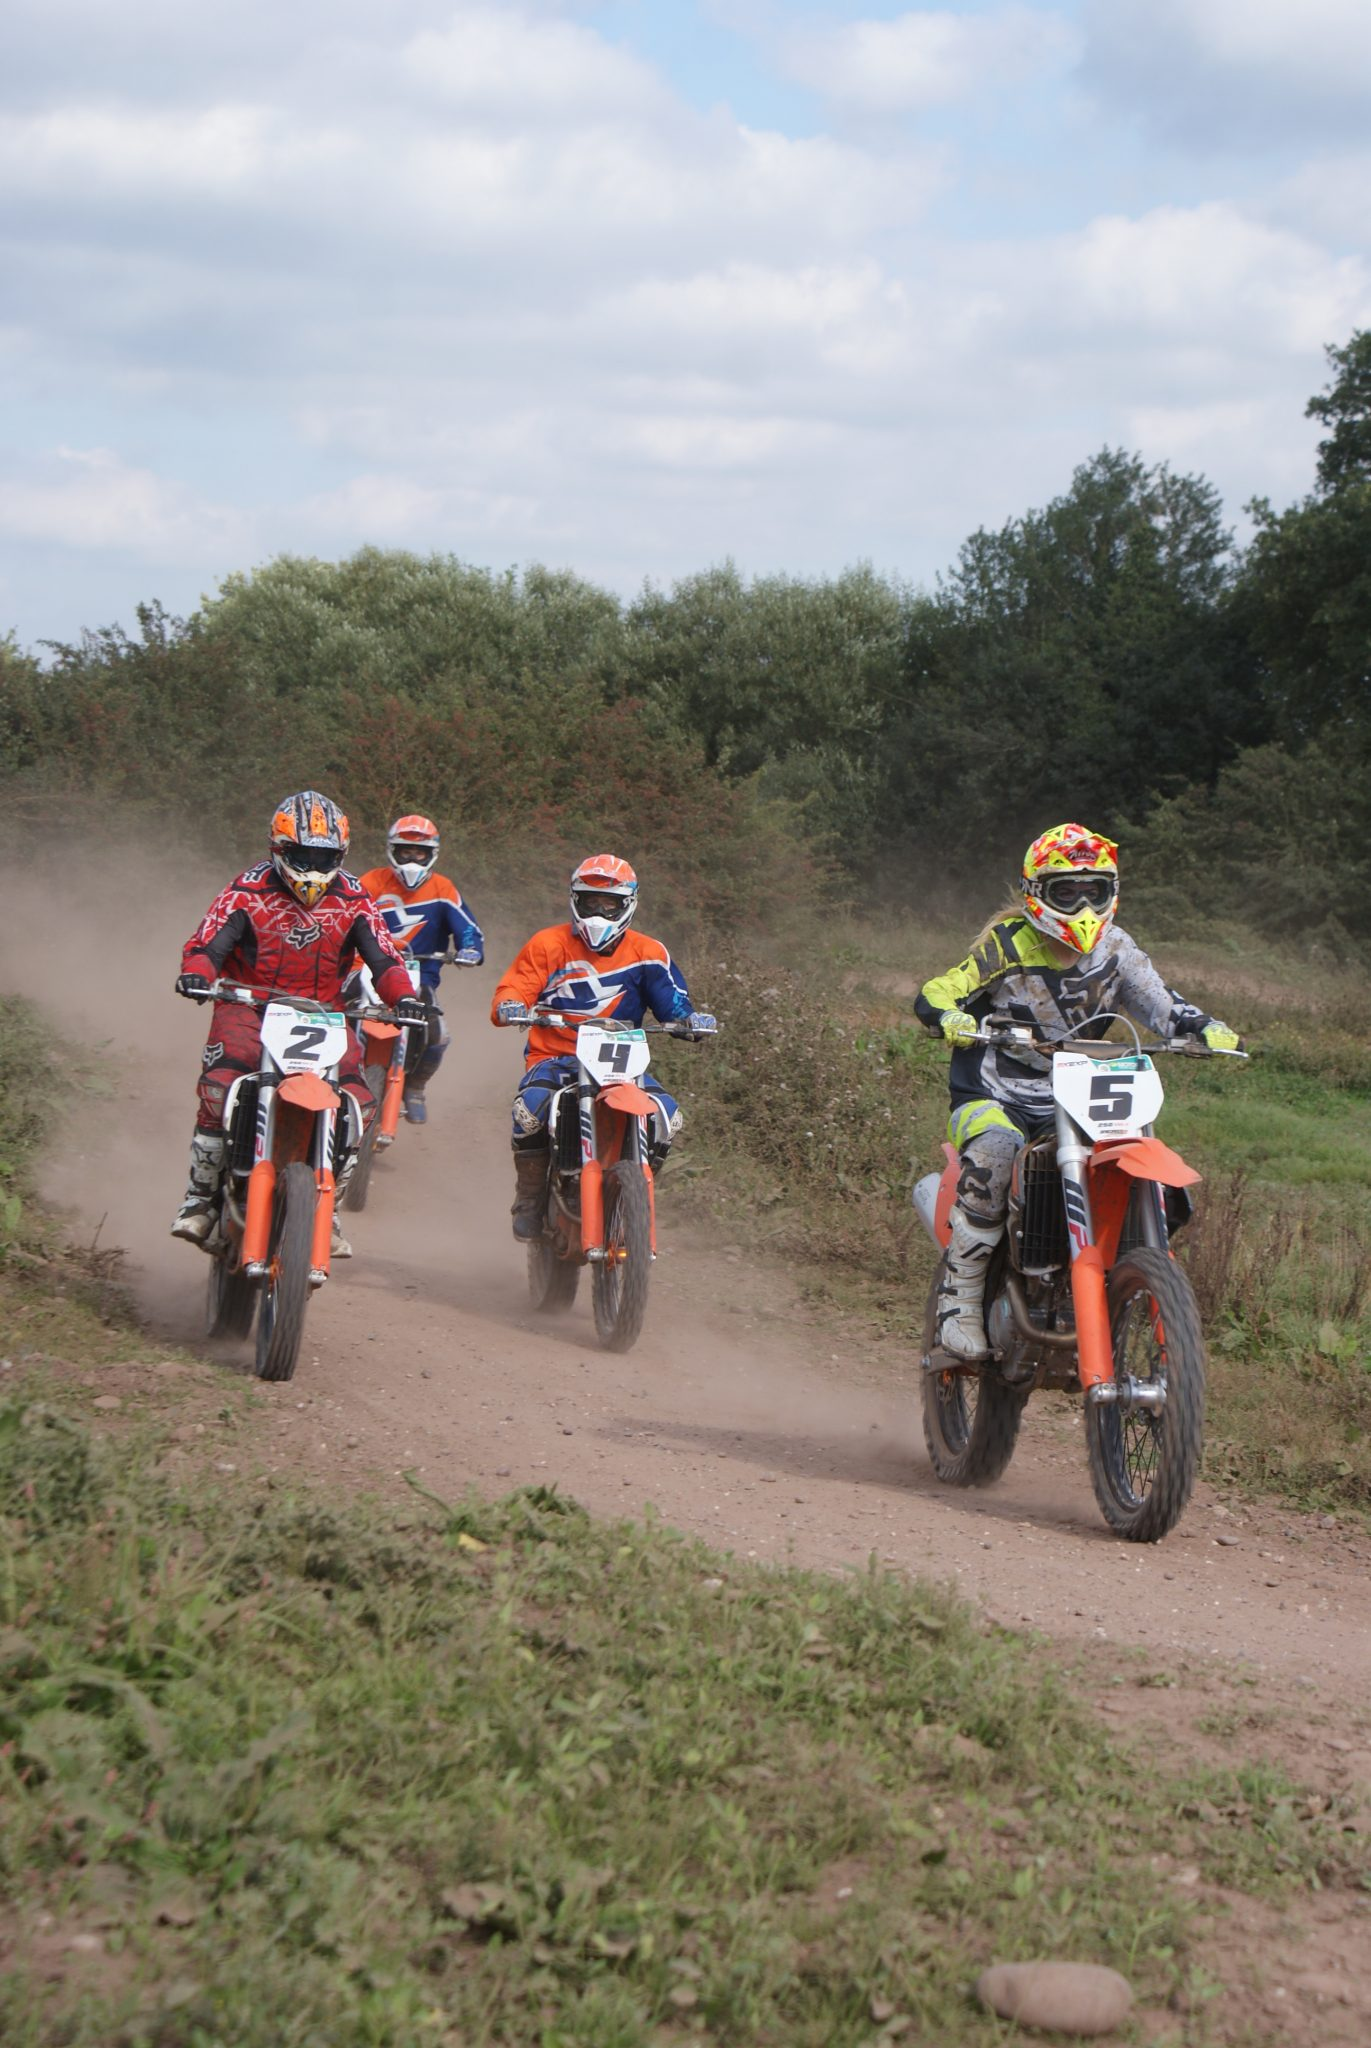 Motocross Experience Days Dirt Biking Trail Riding Ktm Motocross Experience